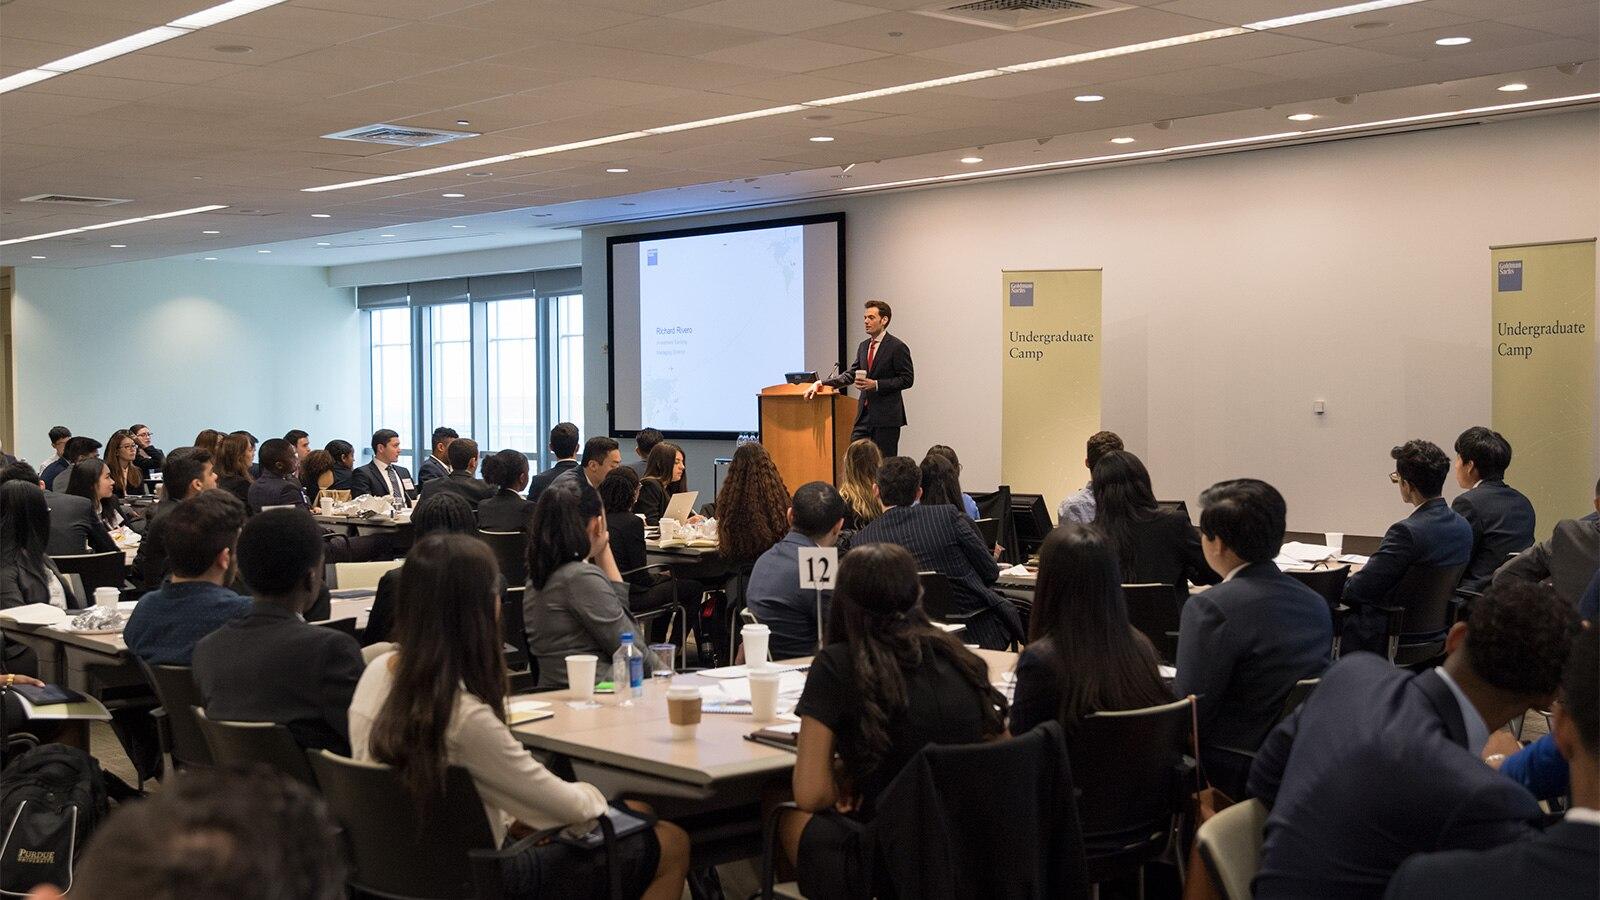 Goldman Sachs | Student Programs - Goldman Sachs Undergraduate Camp